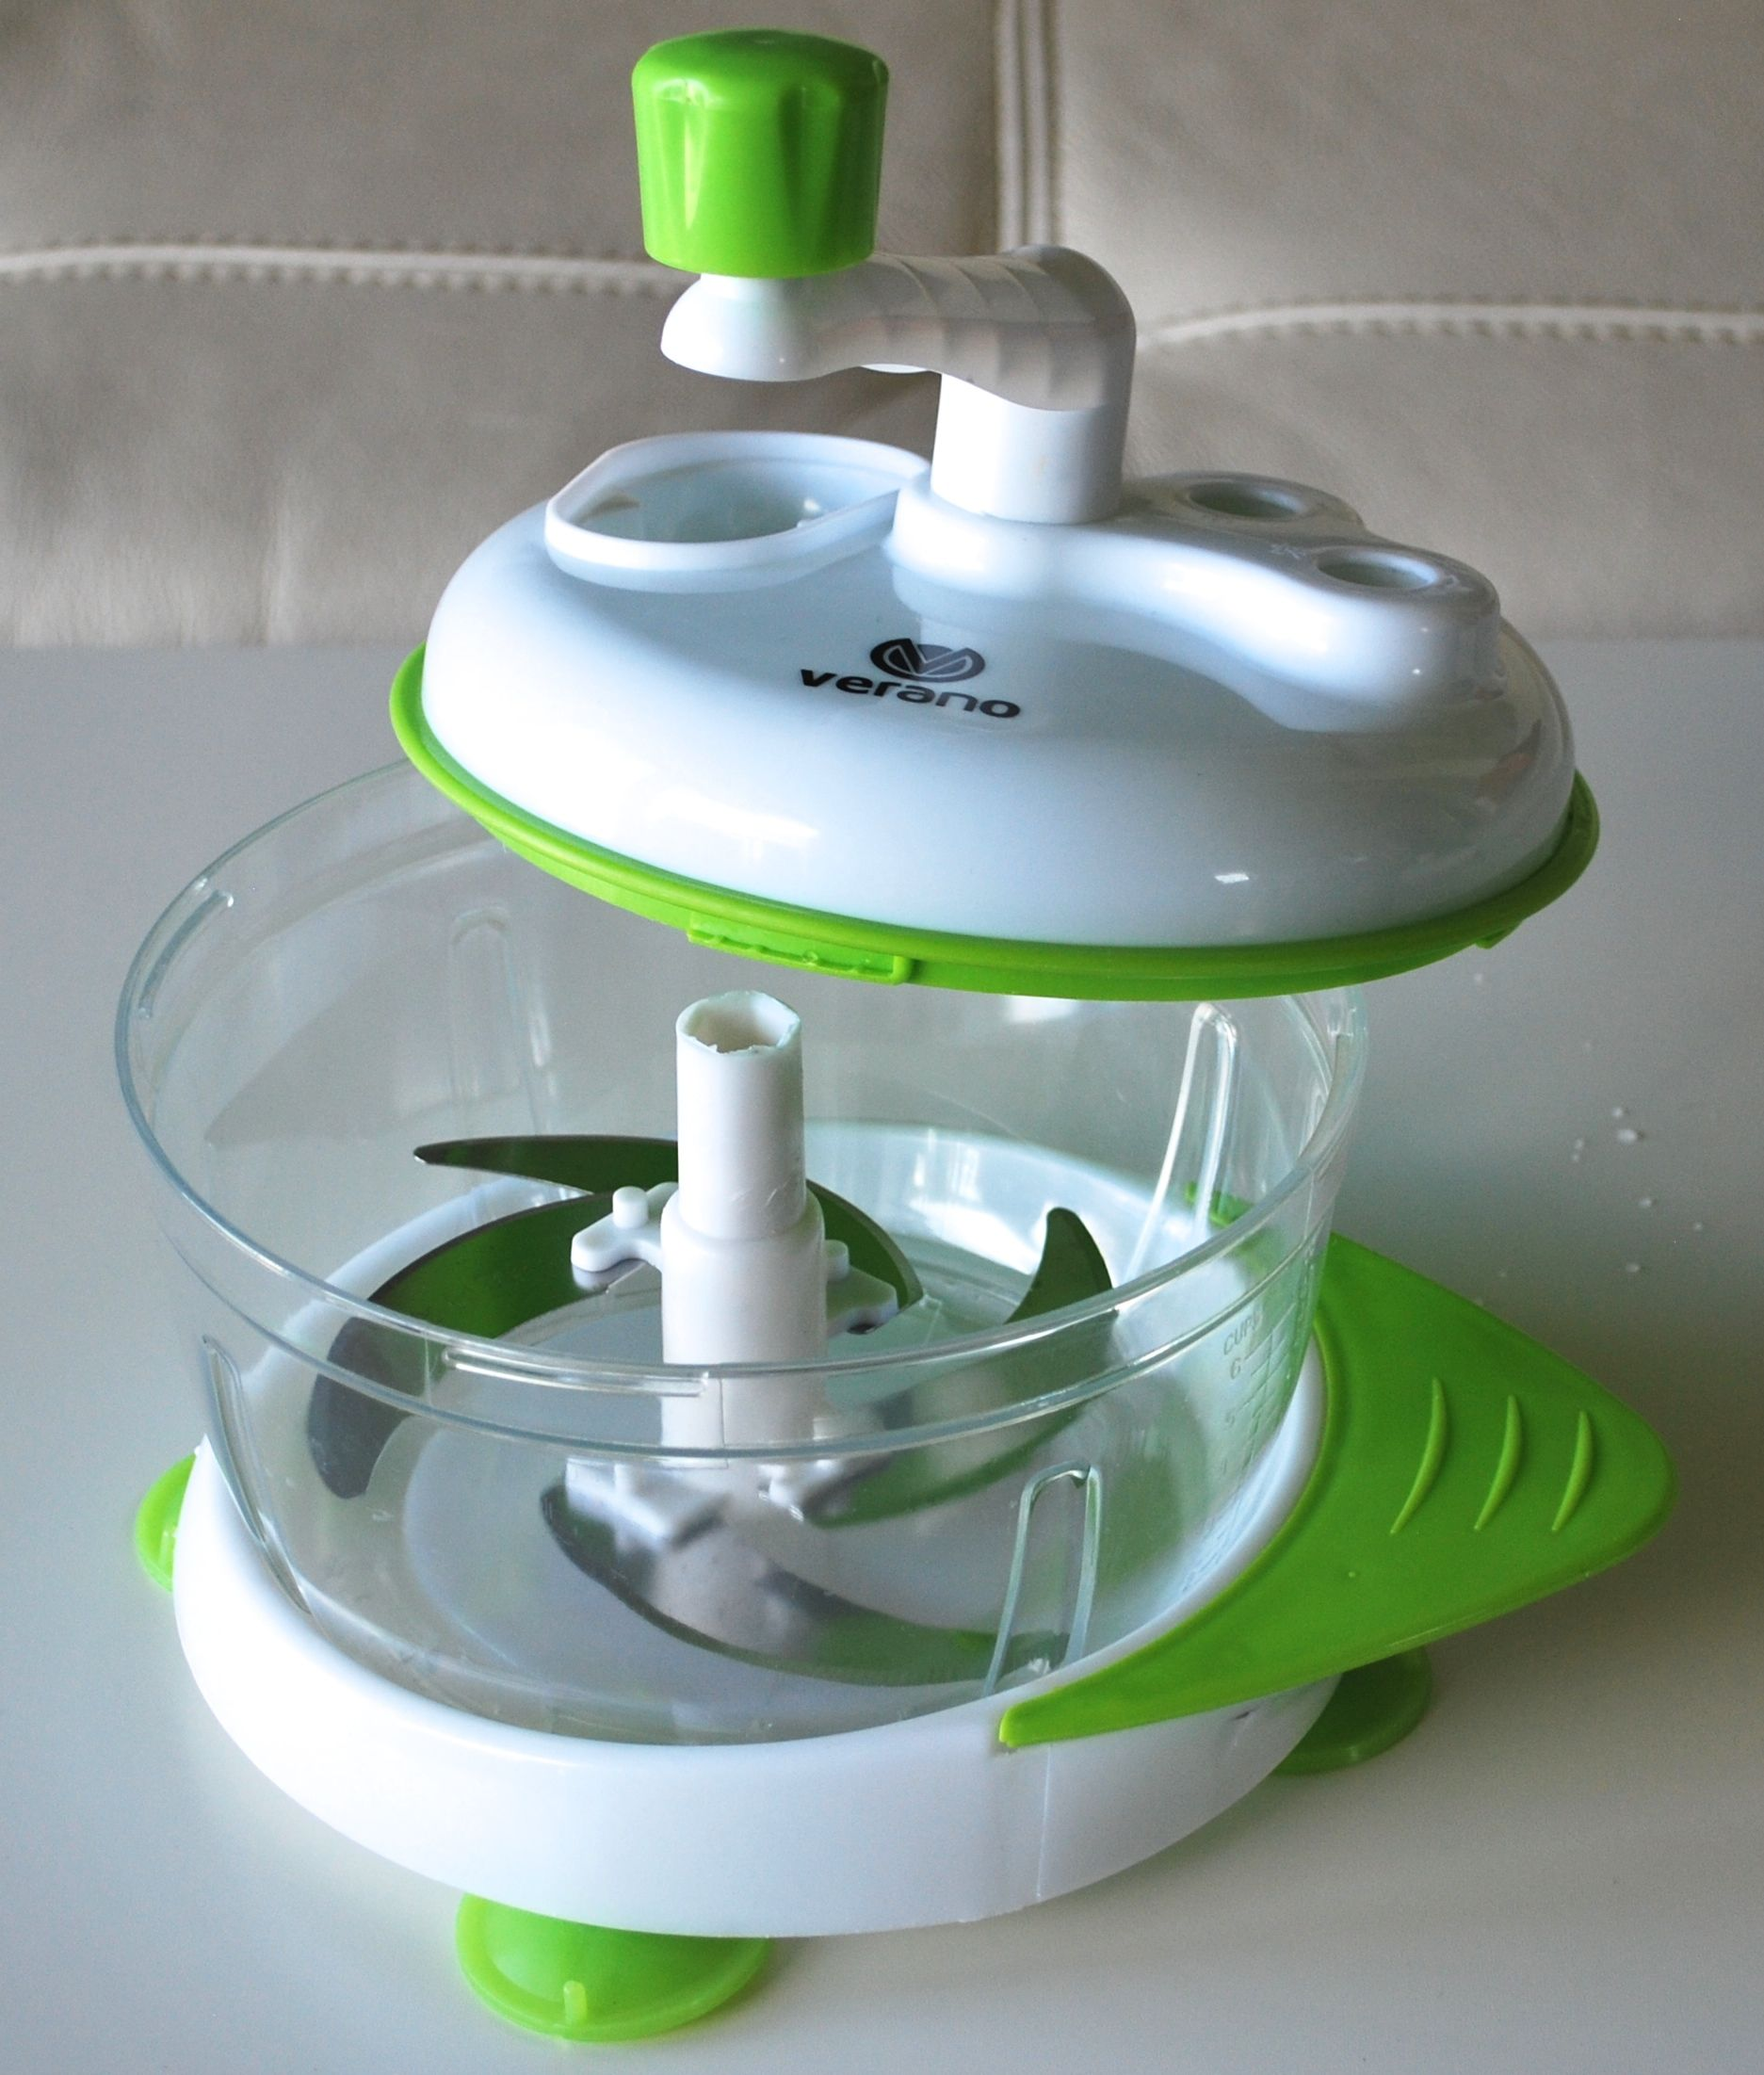 Beau Verano® Universal Hand Powered Food Chopper / Manual Food Processor Is  Perfect Onion Chopper